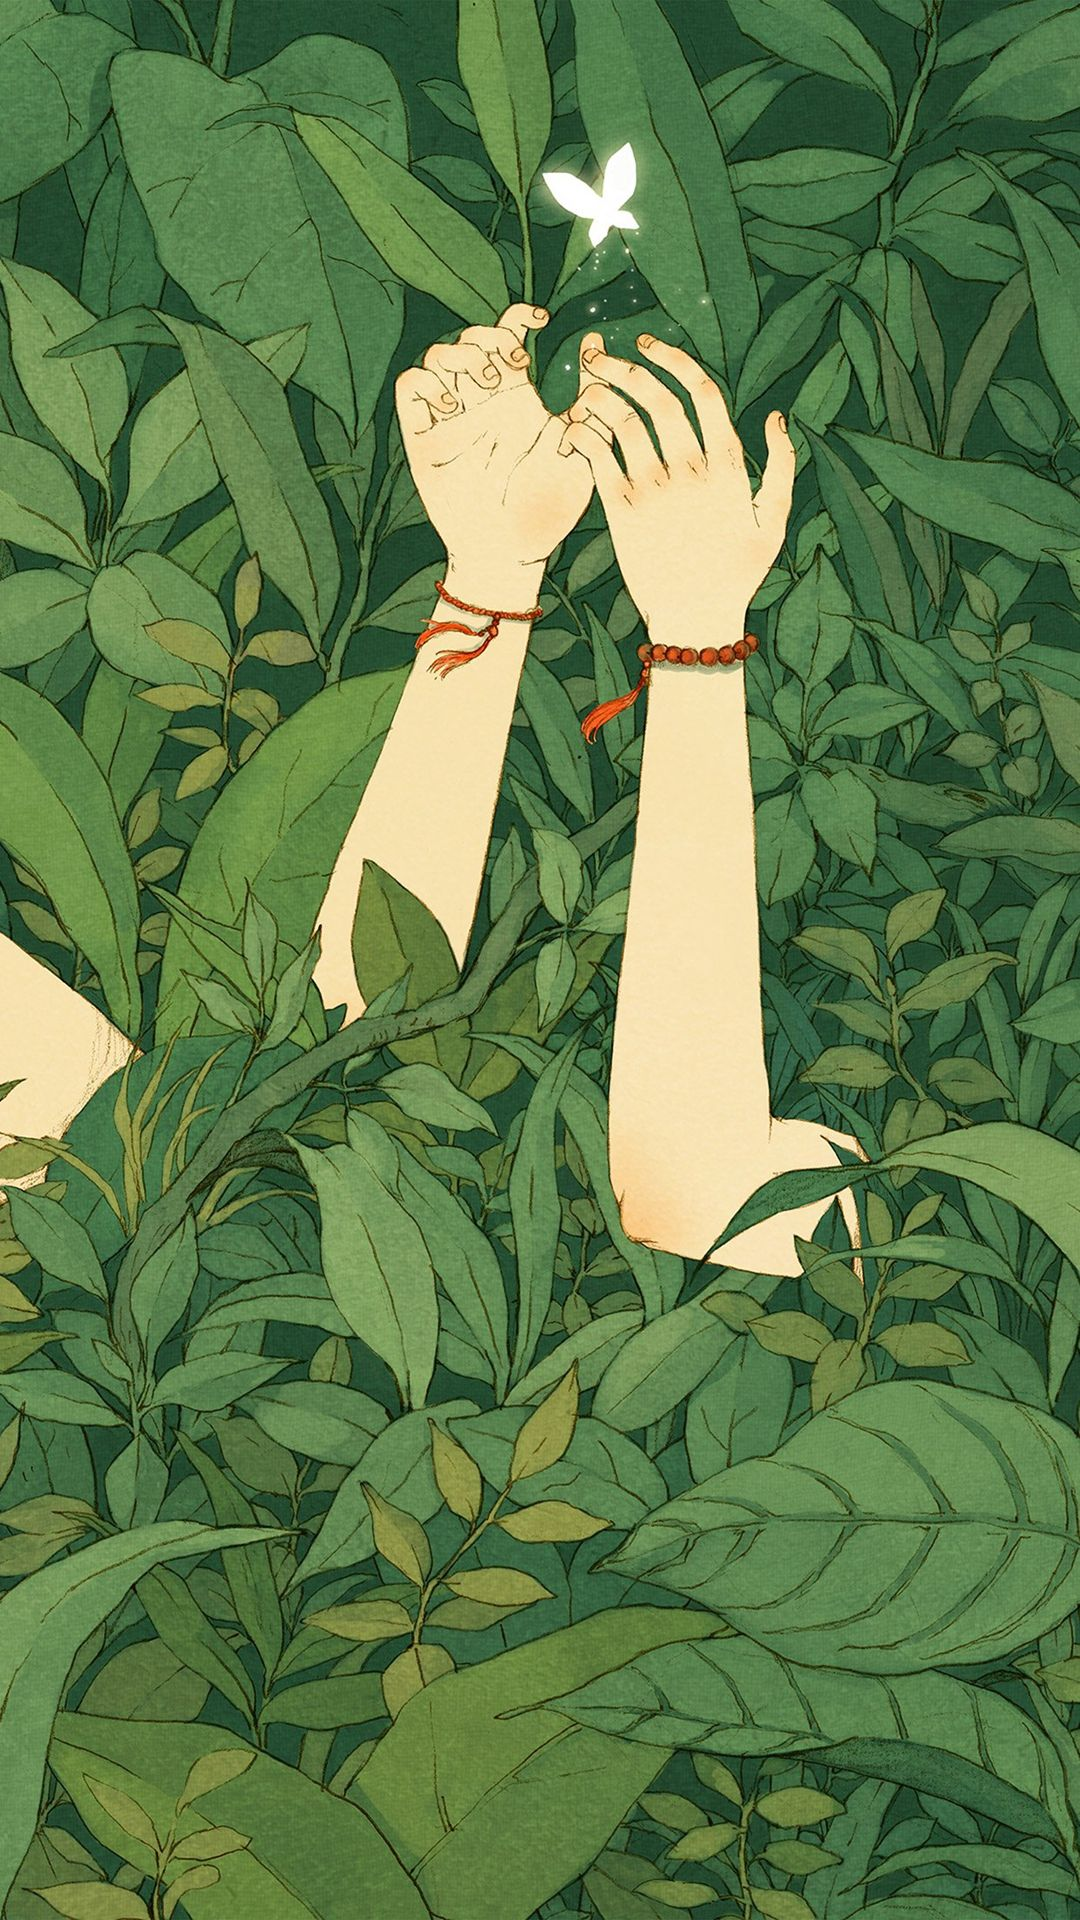 Green Wood Forest Love Butterfly Illustration Art IPhone 6 Wallpaper